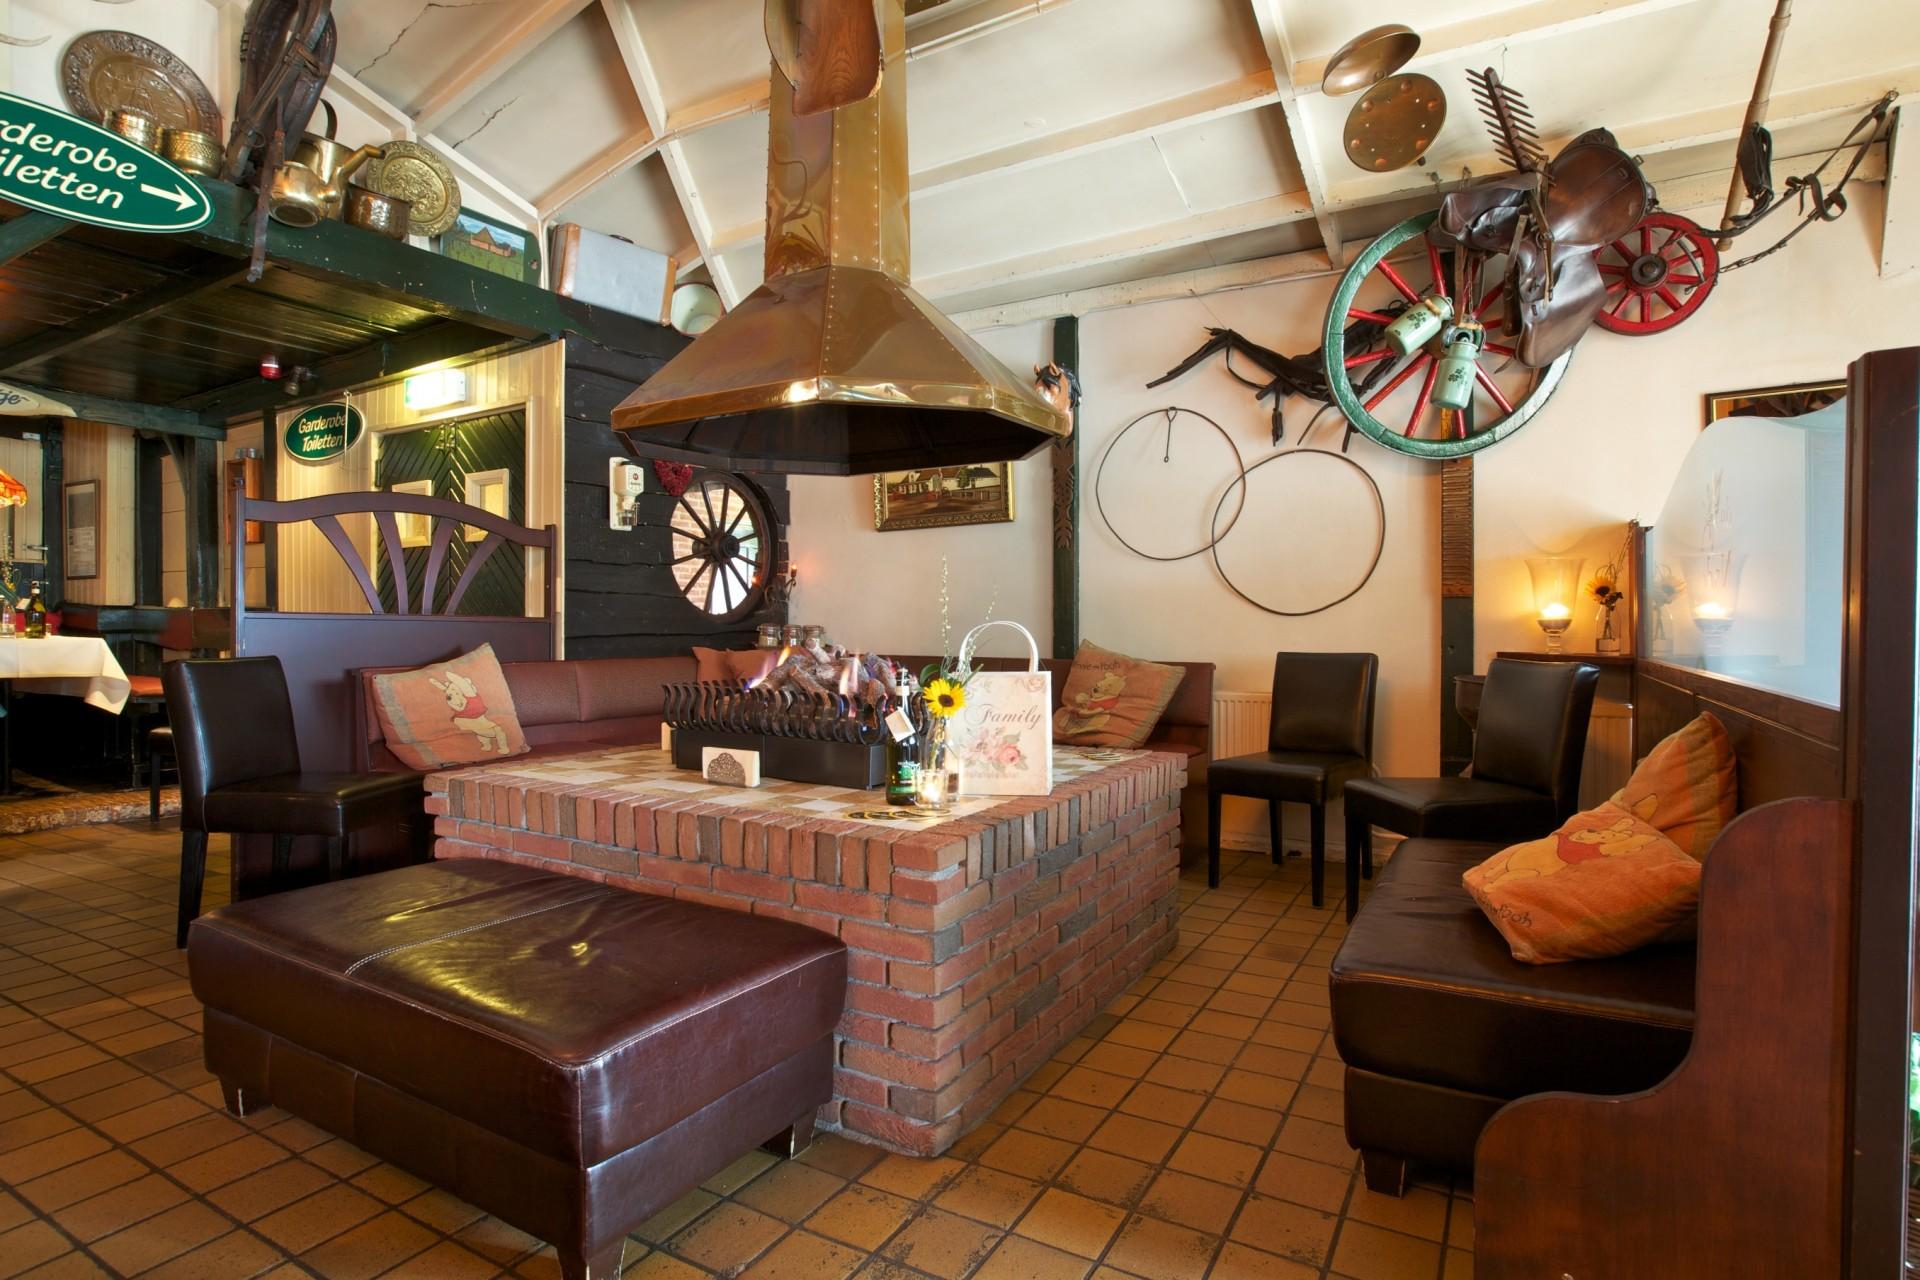 Nadorst-restaurant-uitspanning-faciliteiten-zalen-oude-boerderij-3